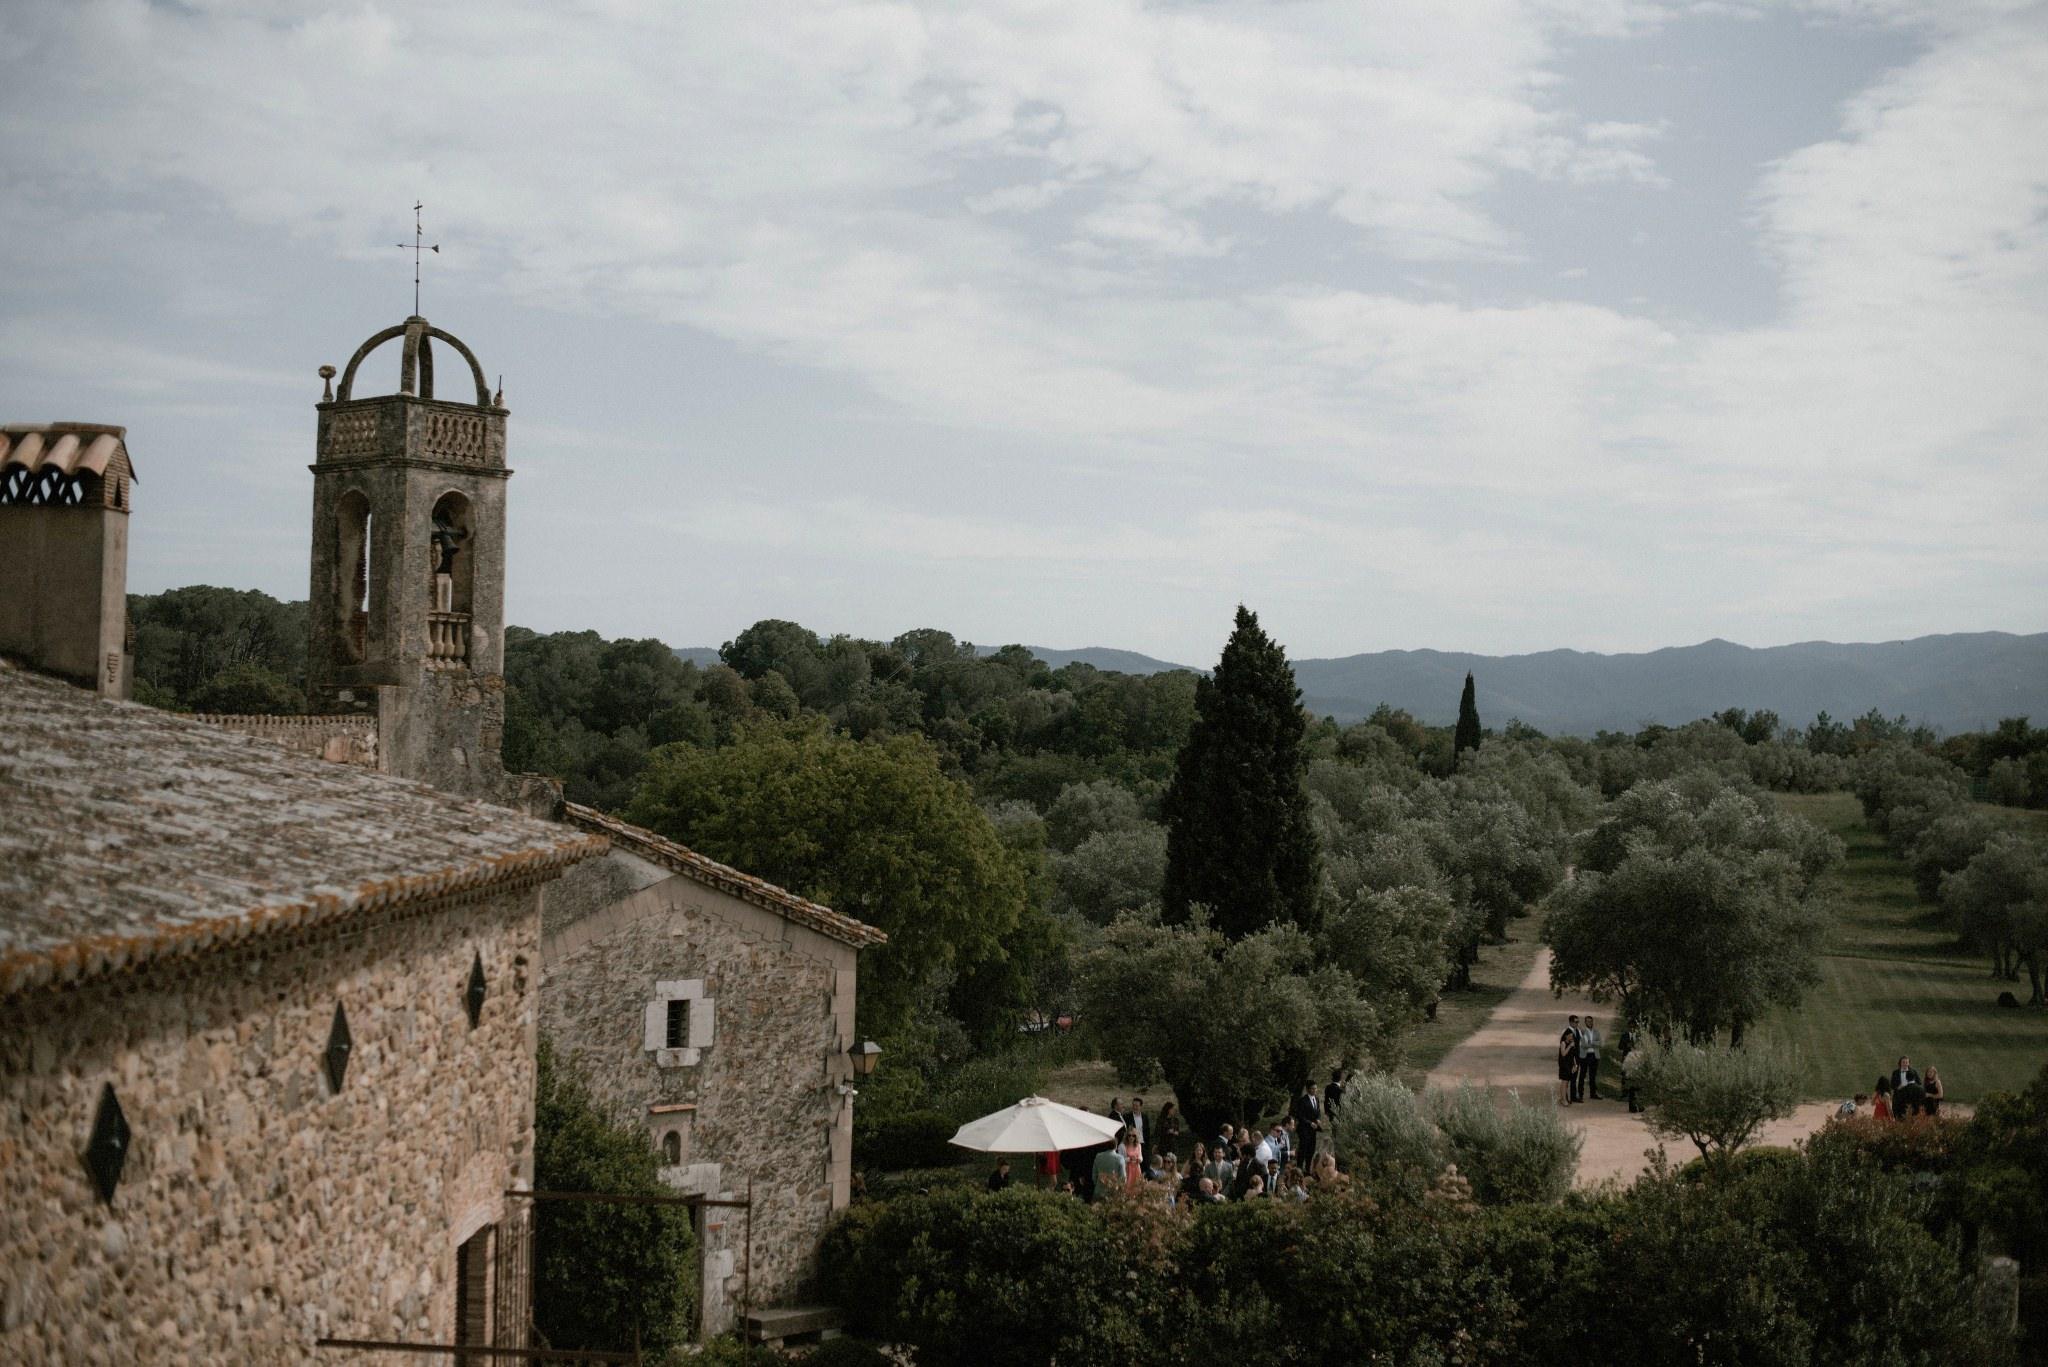 Bruidsfotograaf Spanje Castle d'Emporda destination wedding Naomi van der Kraan00023.jpg